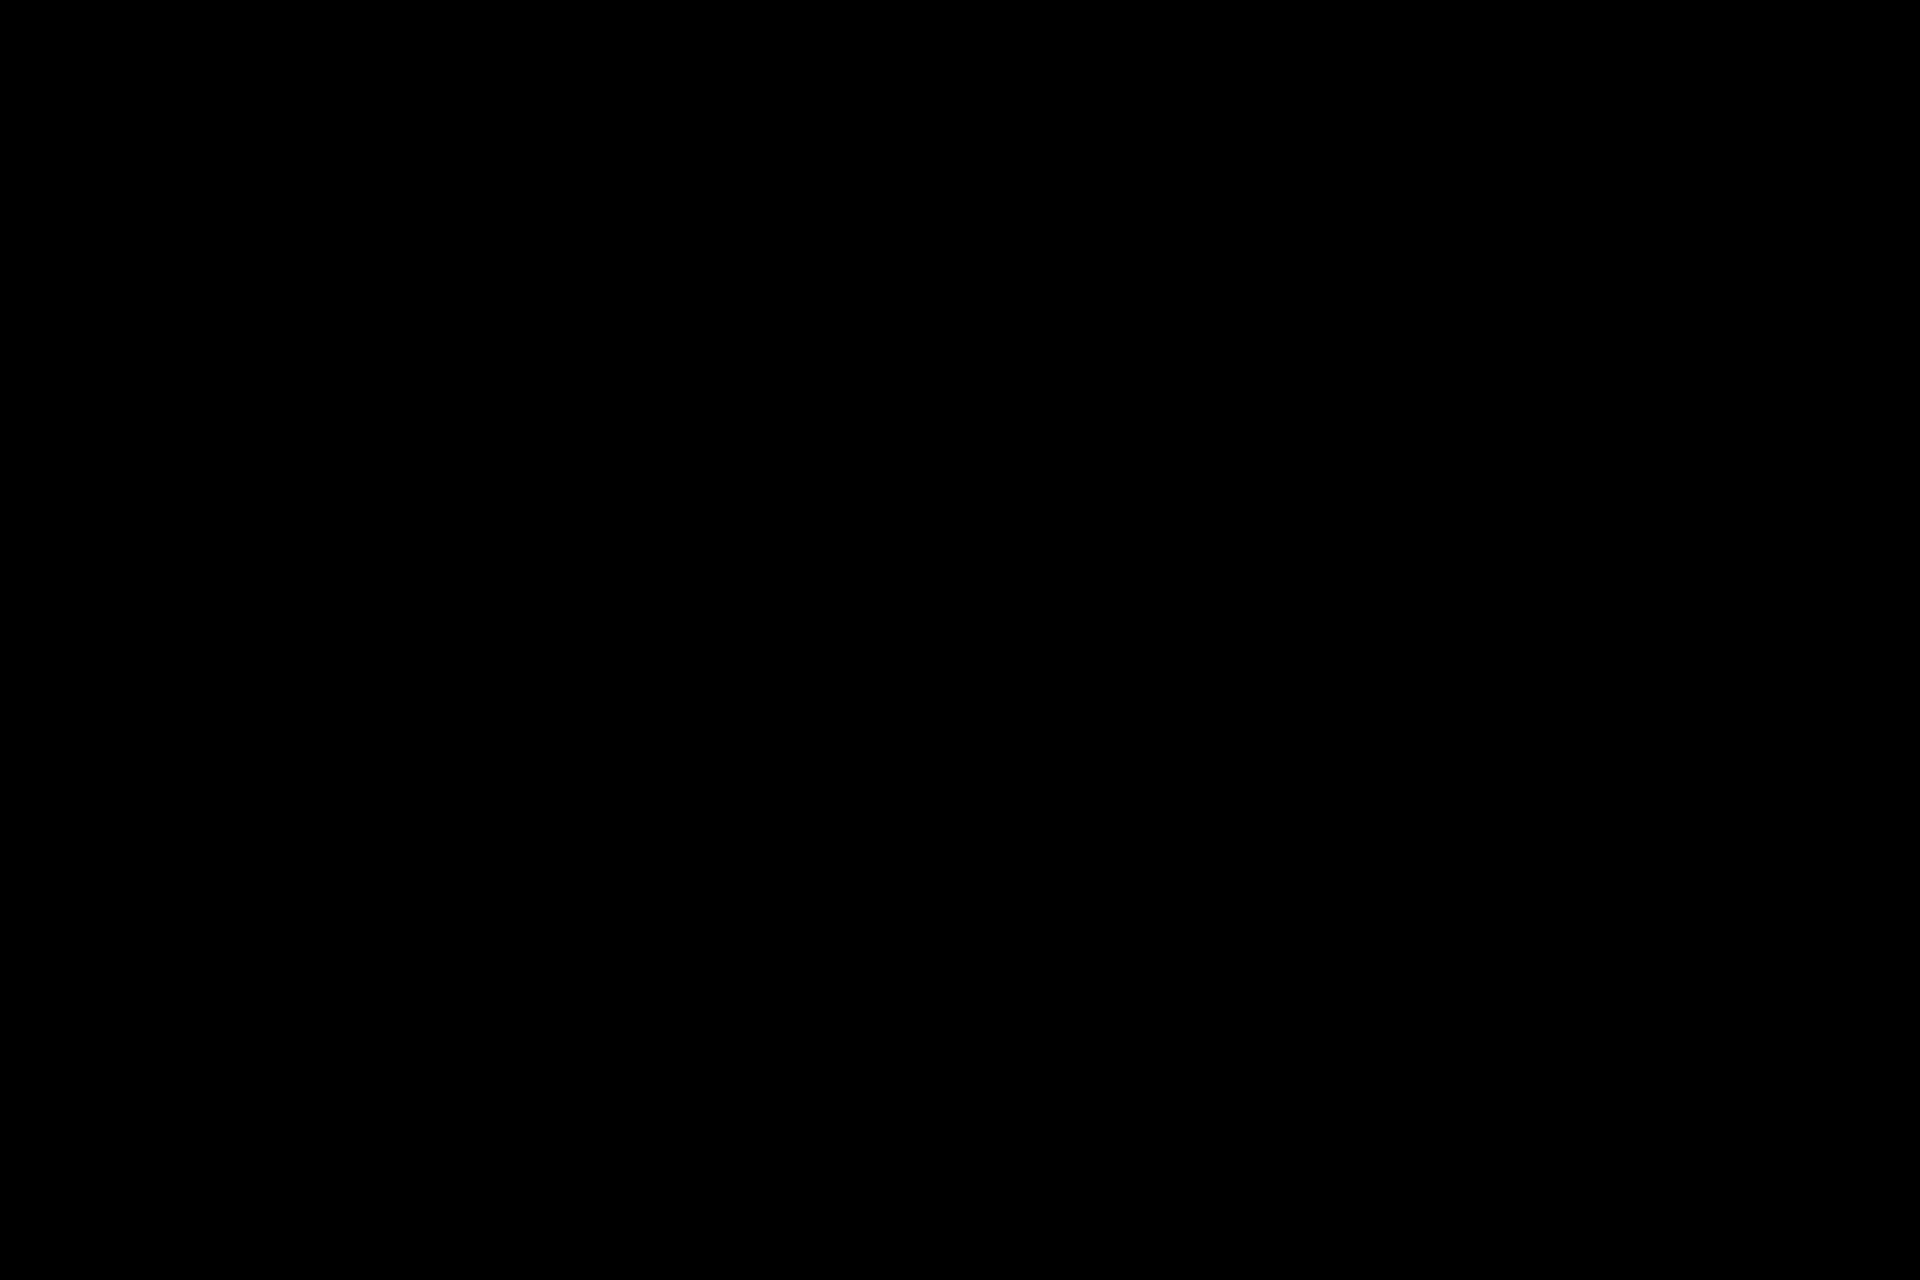 starbucks-2346226_1920